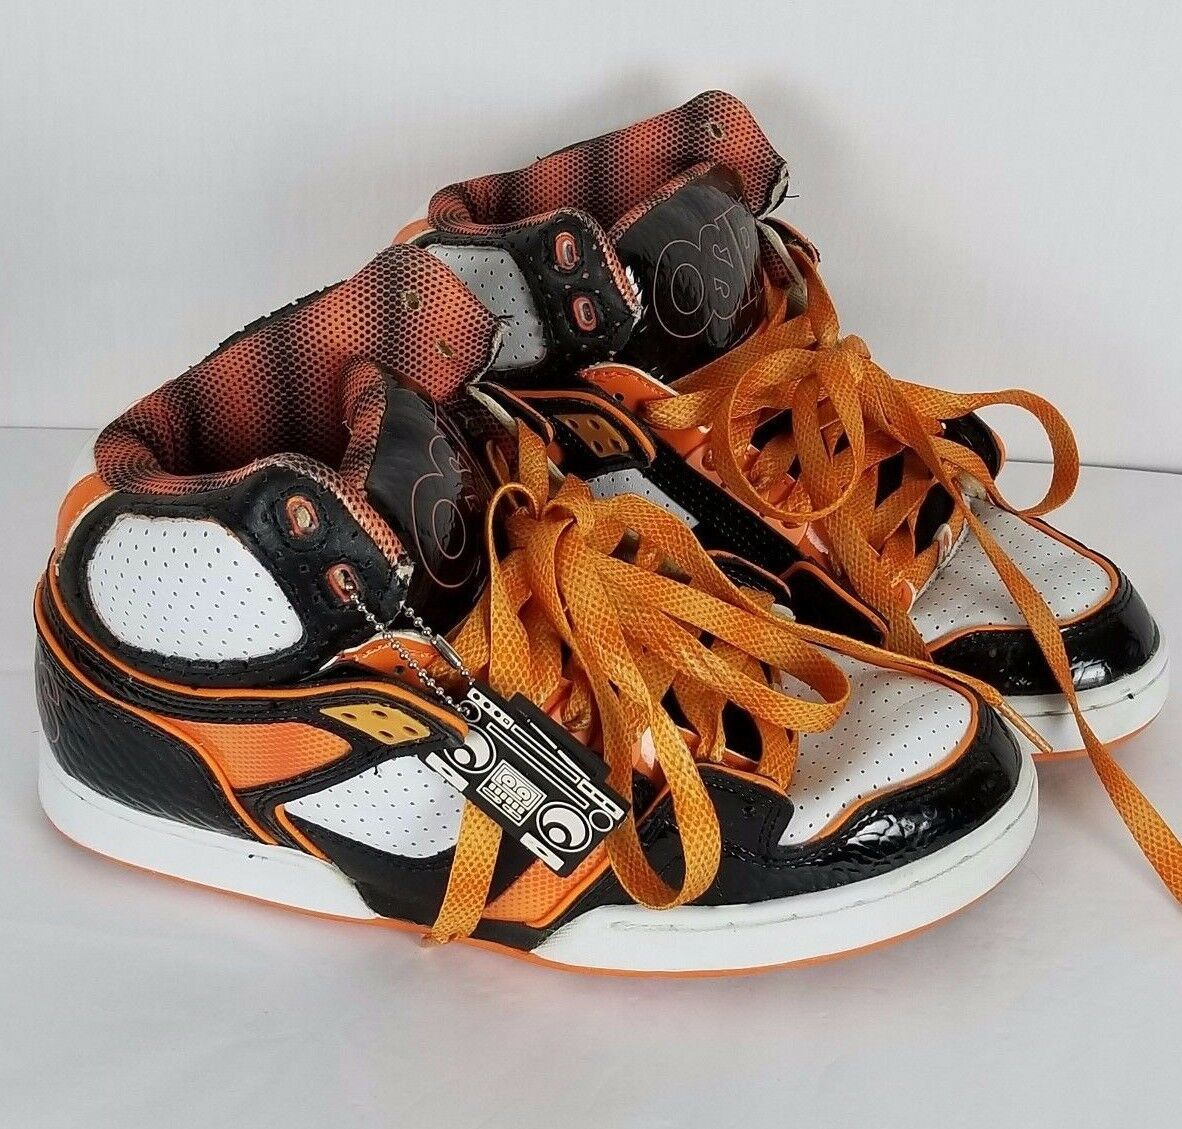 OSIRIS NYC 83 Ultra Black Orange White Skateboard Shoes size USA 7